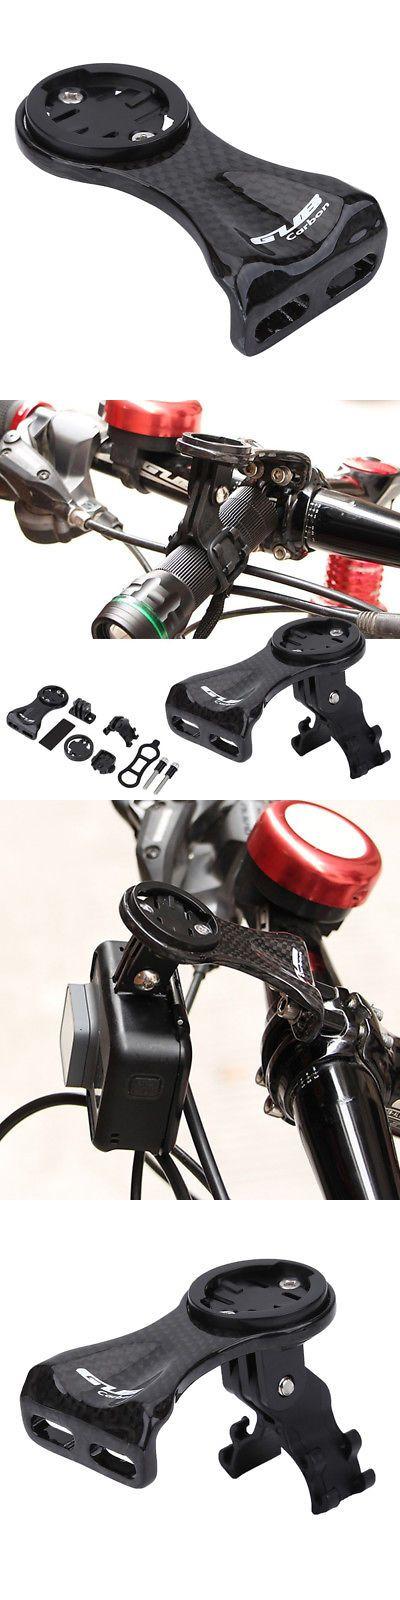 Light Dual-Clamp Mount 31.8mm FSA Control Center Bike Handlebar Computer